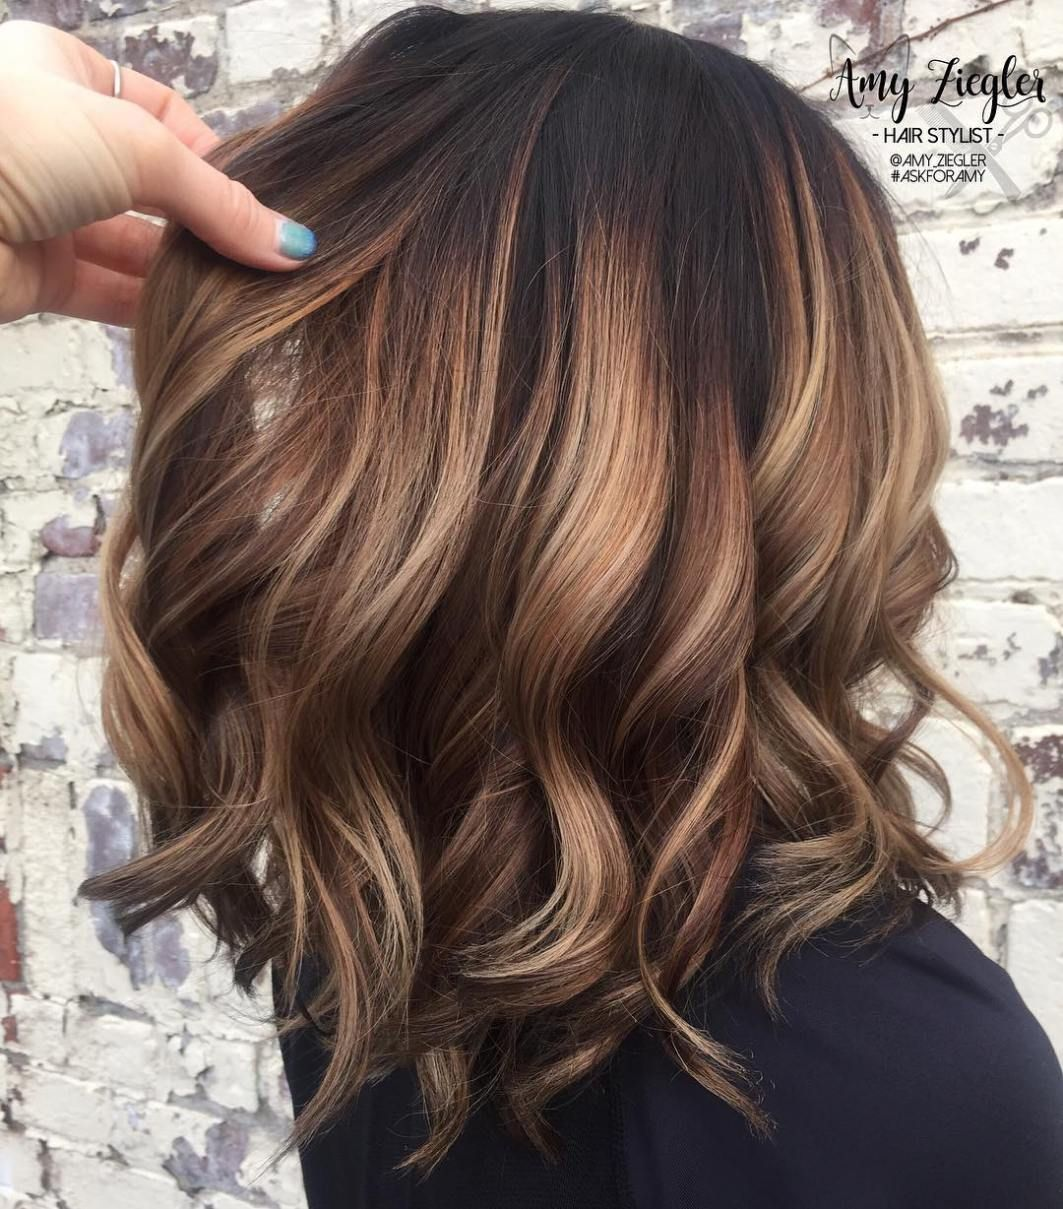 Curly Caramel Balayage Bob Mid Length Haircuts Pinterest